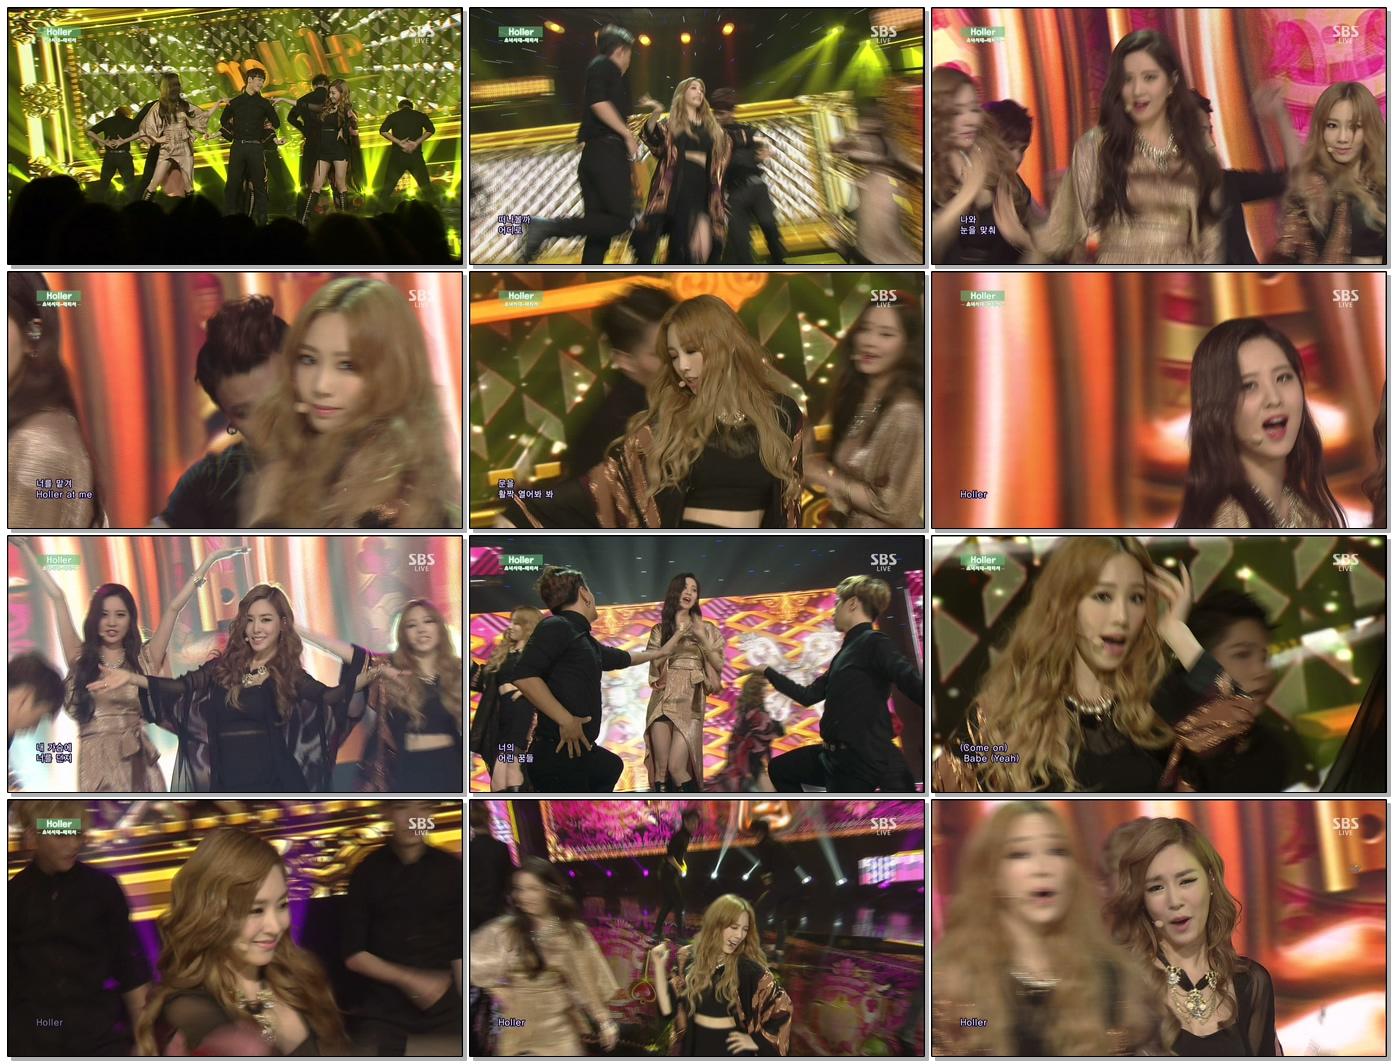 20170911.0938.03 Girls' Generation-TTS (TaeTiSeo) - Holler (Inkigayo 2014.10.12 HDTV) (JPOP.ru).ts.jpg